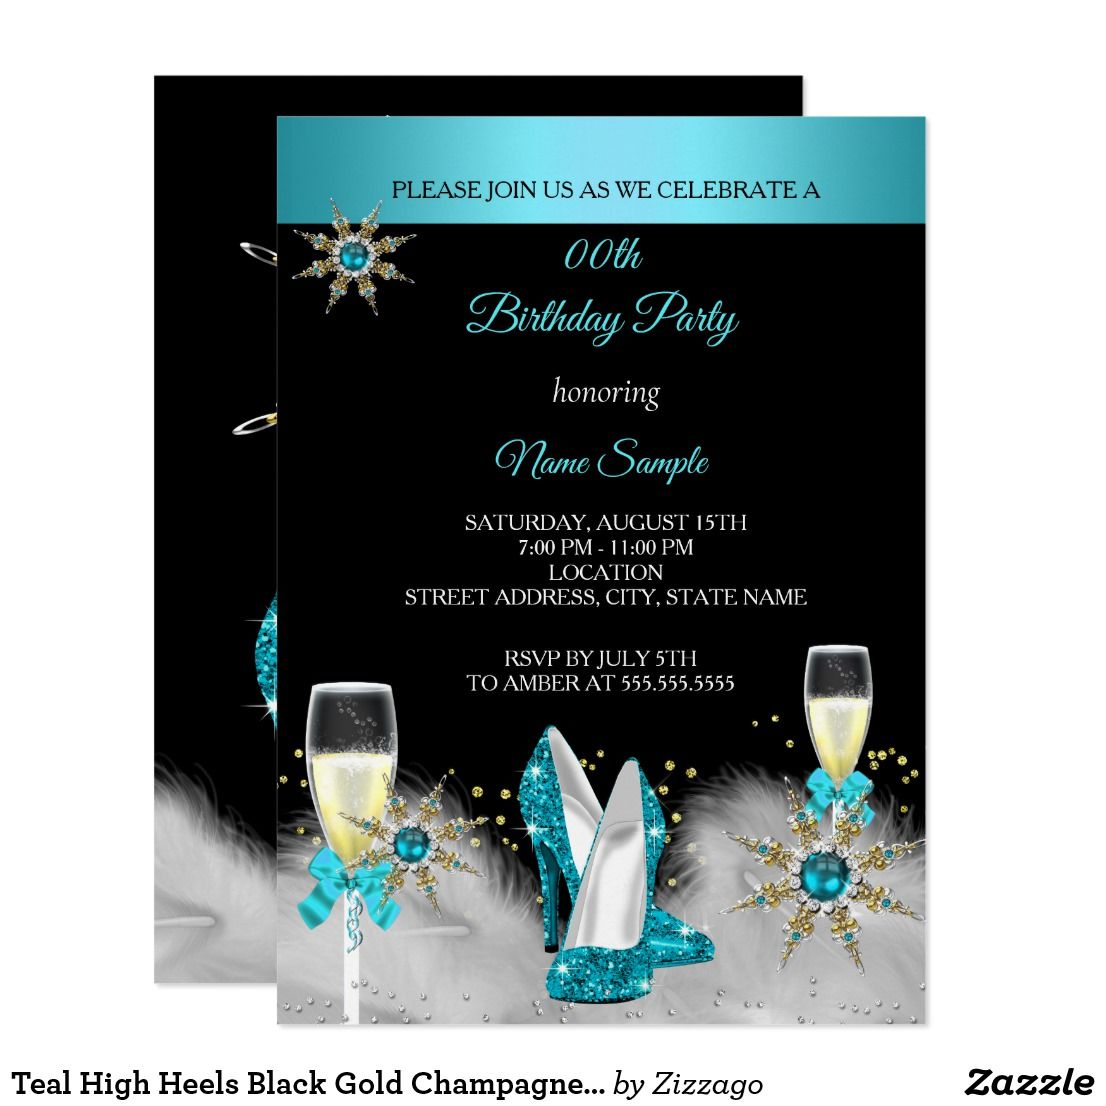 Teal High Heels Black Gold Champagne Party Invitation Zazzle Com Teal High Heels Champagne Party Black High Heels